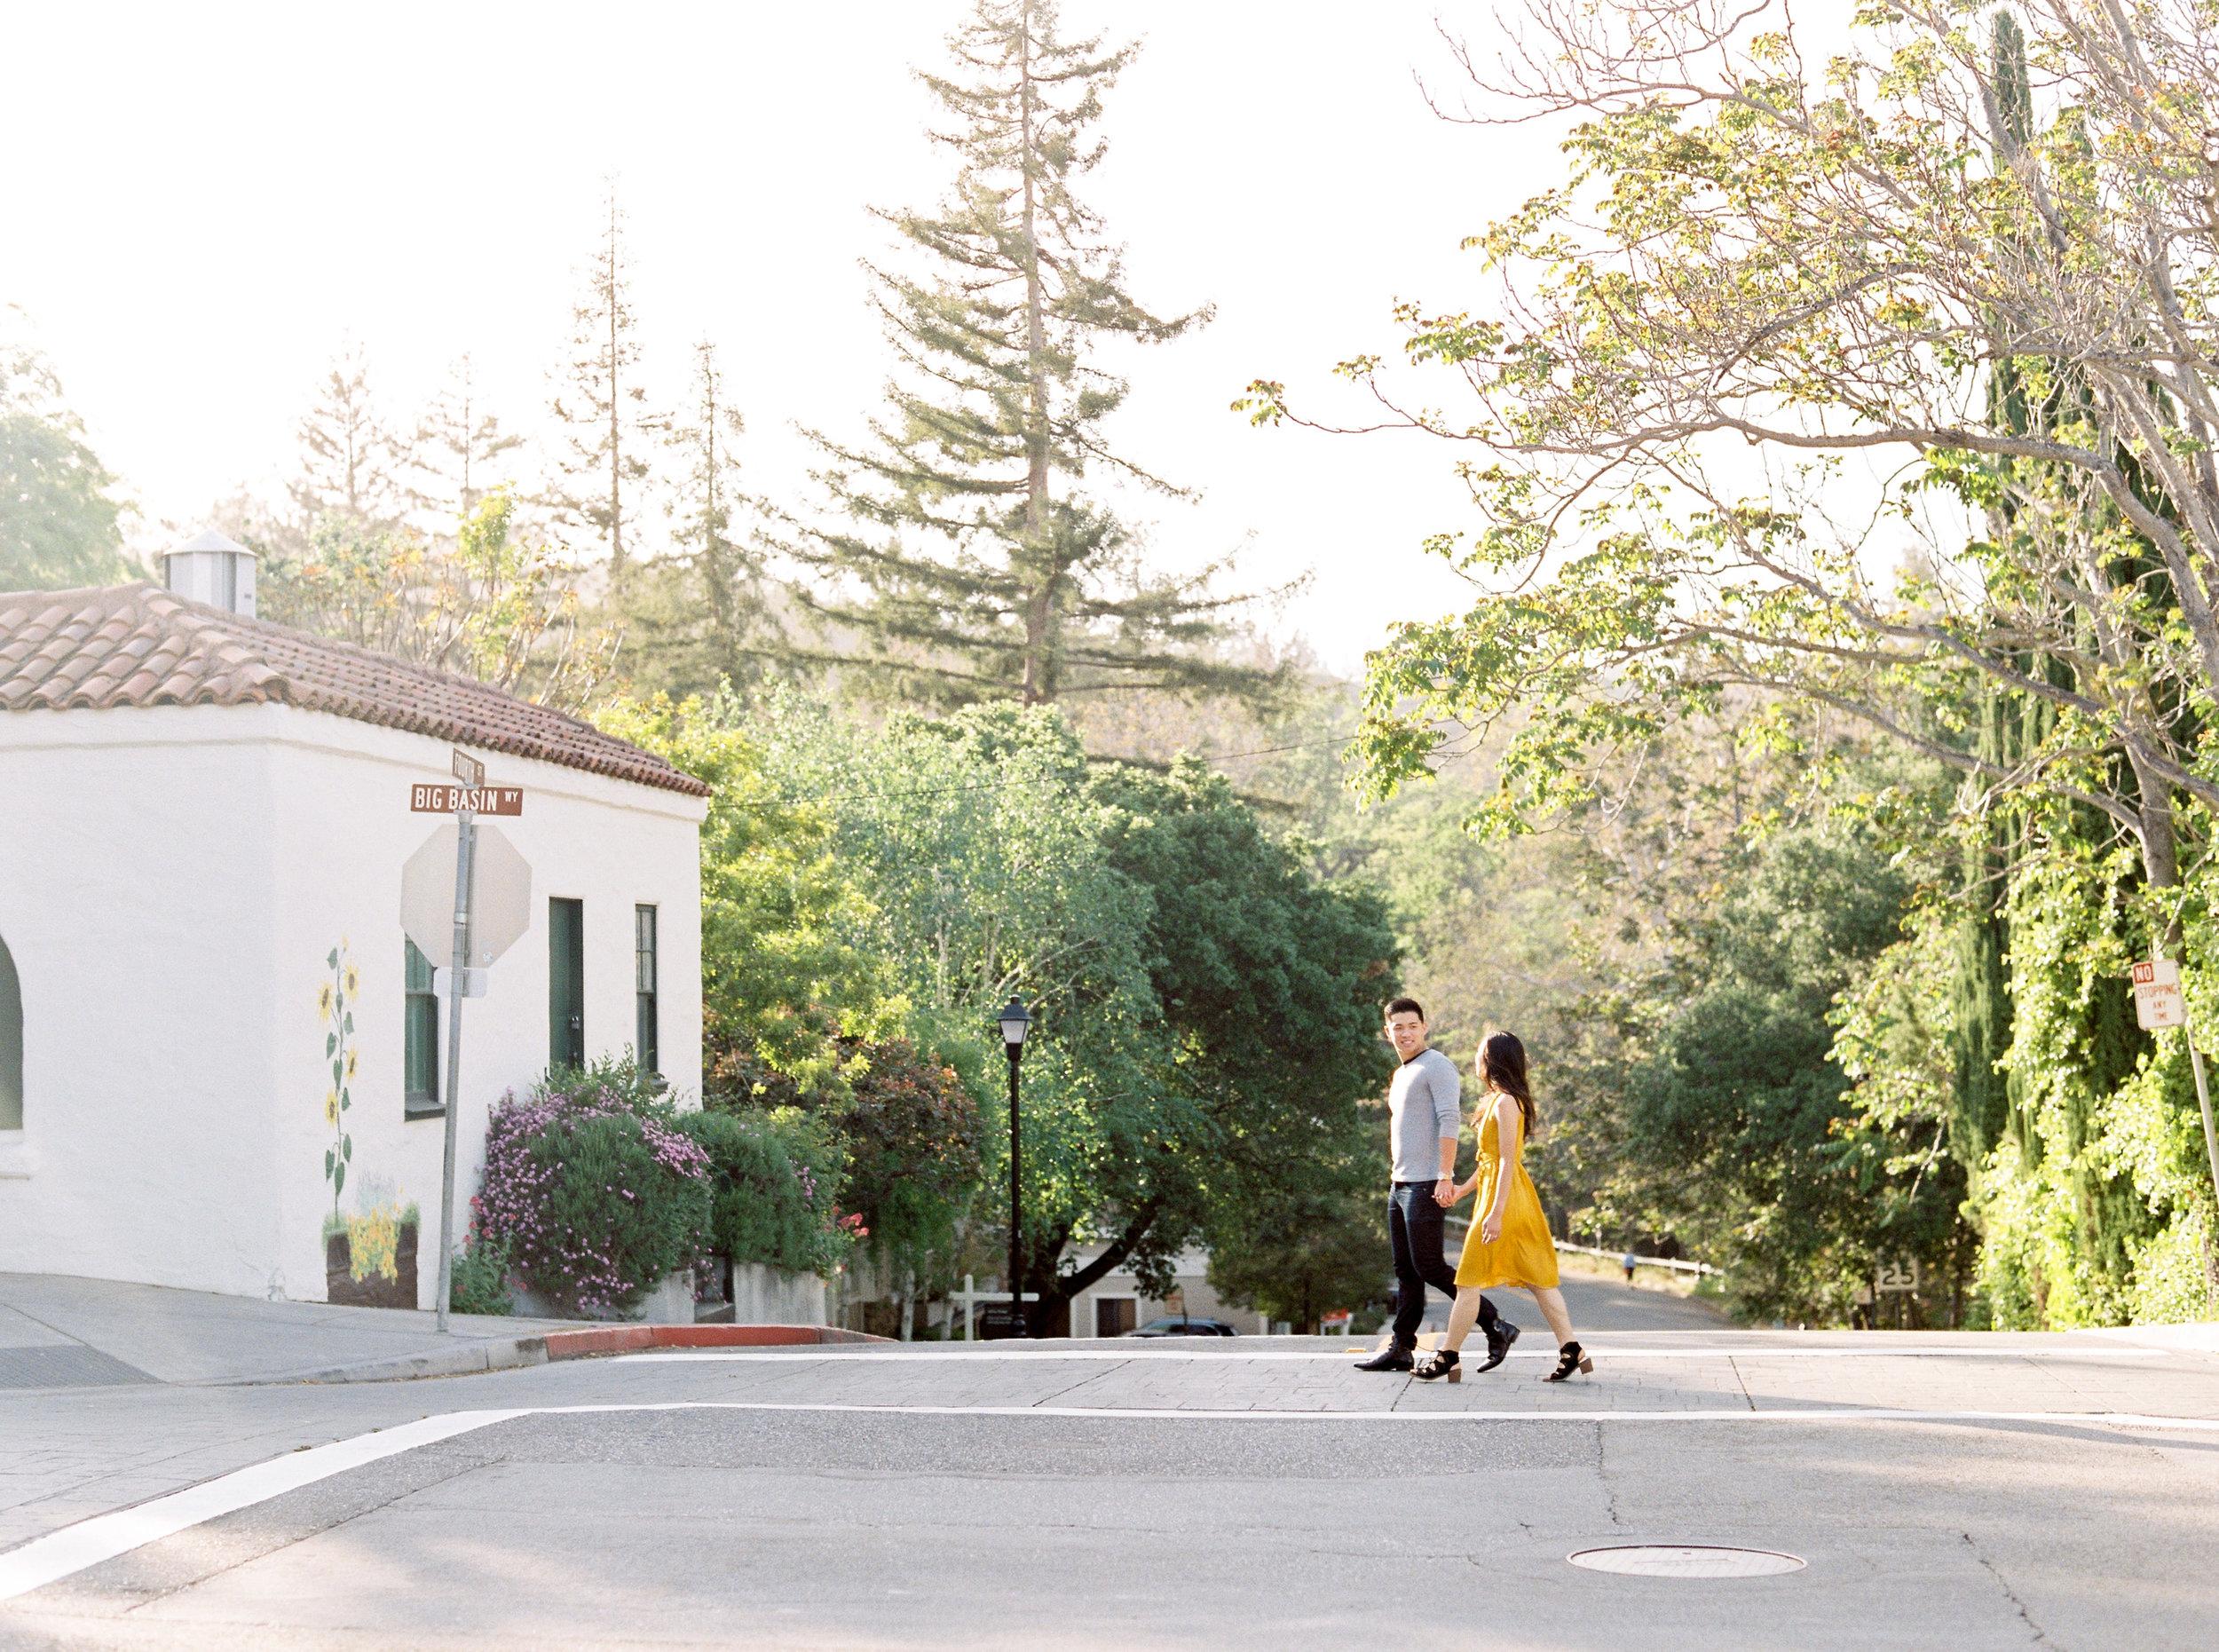 Saratoga Engagement Session - Destination Fine art wedding photography - Kristine Herman Photography